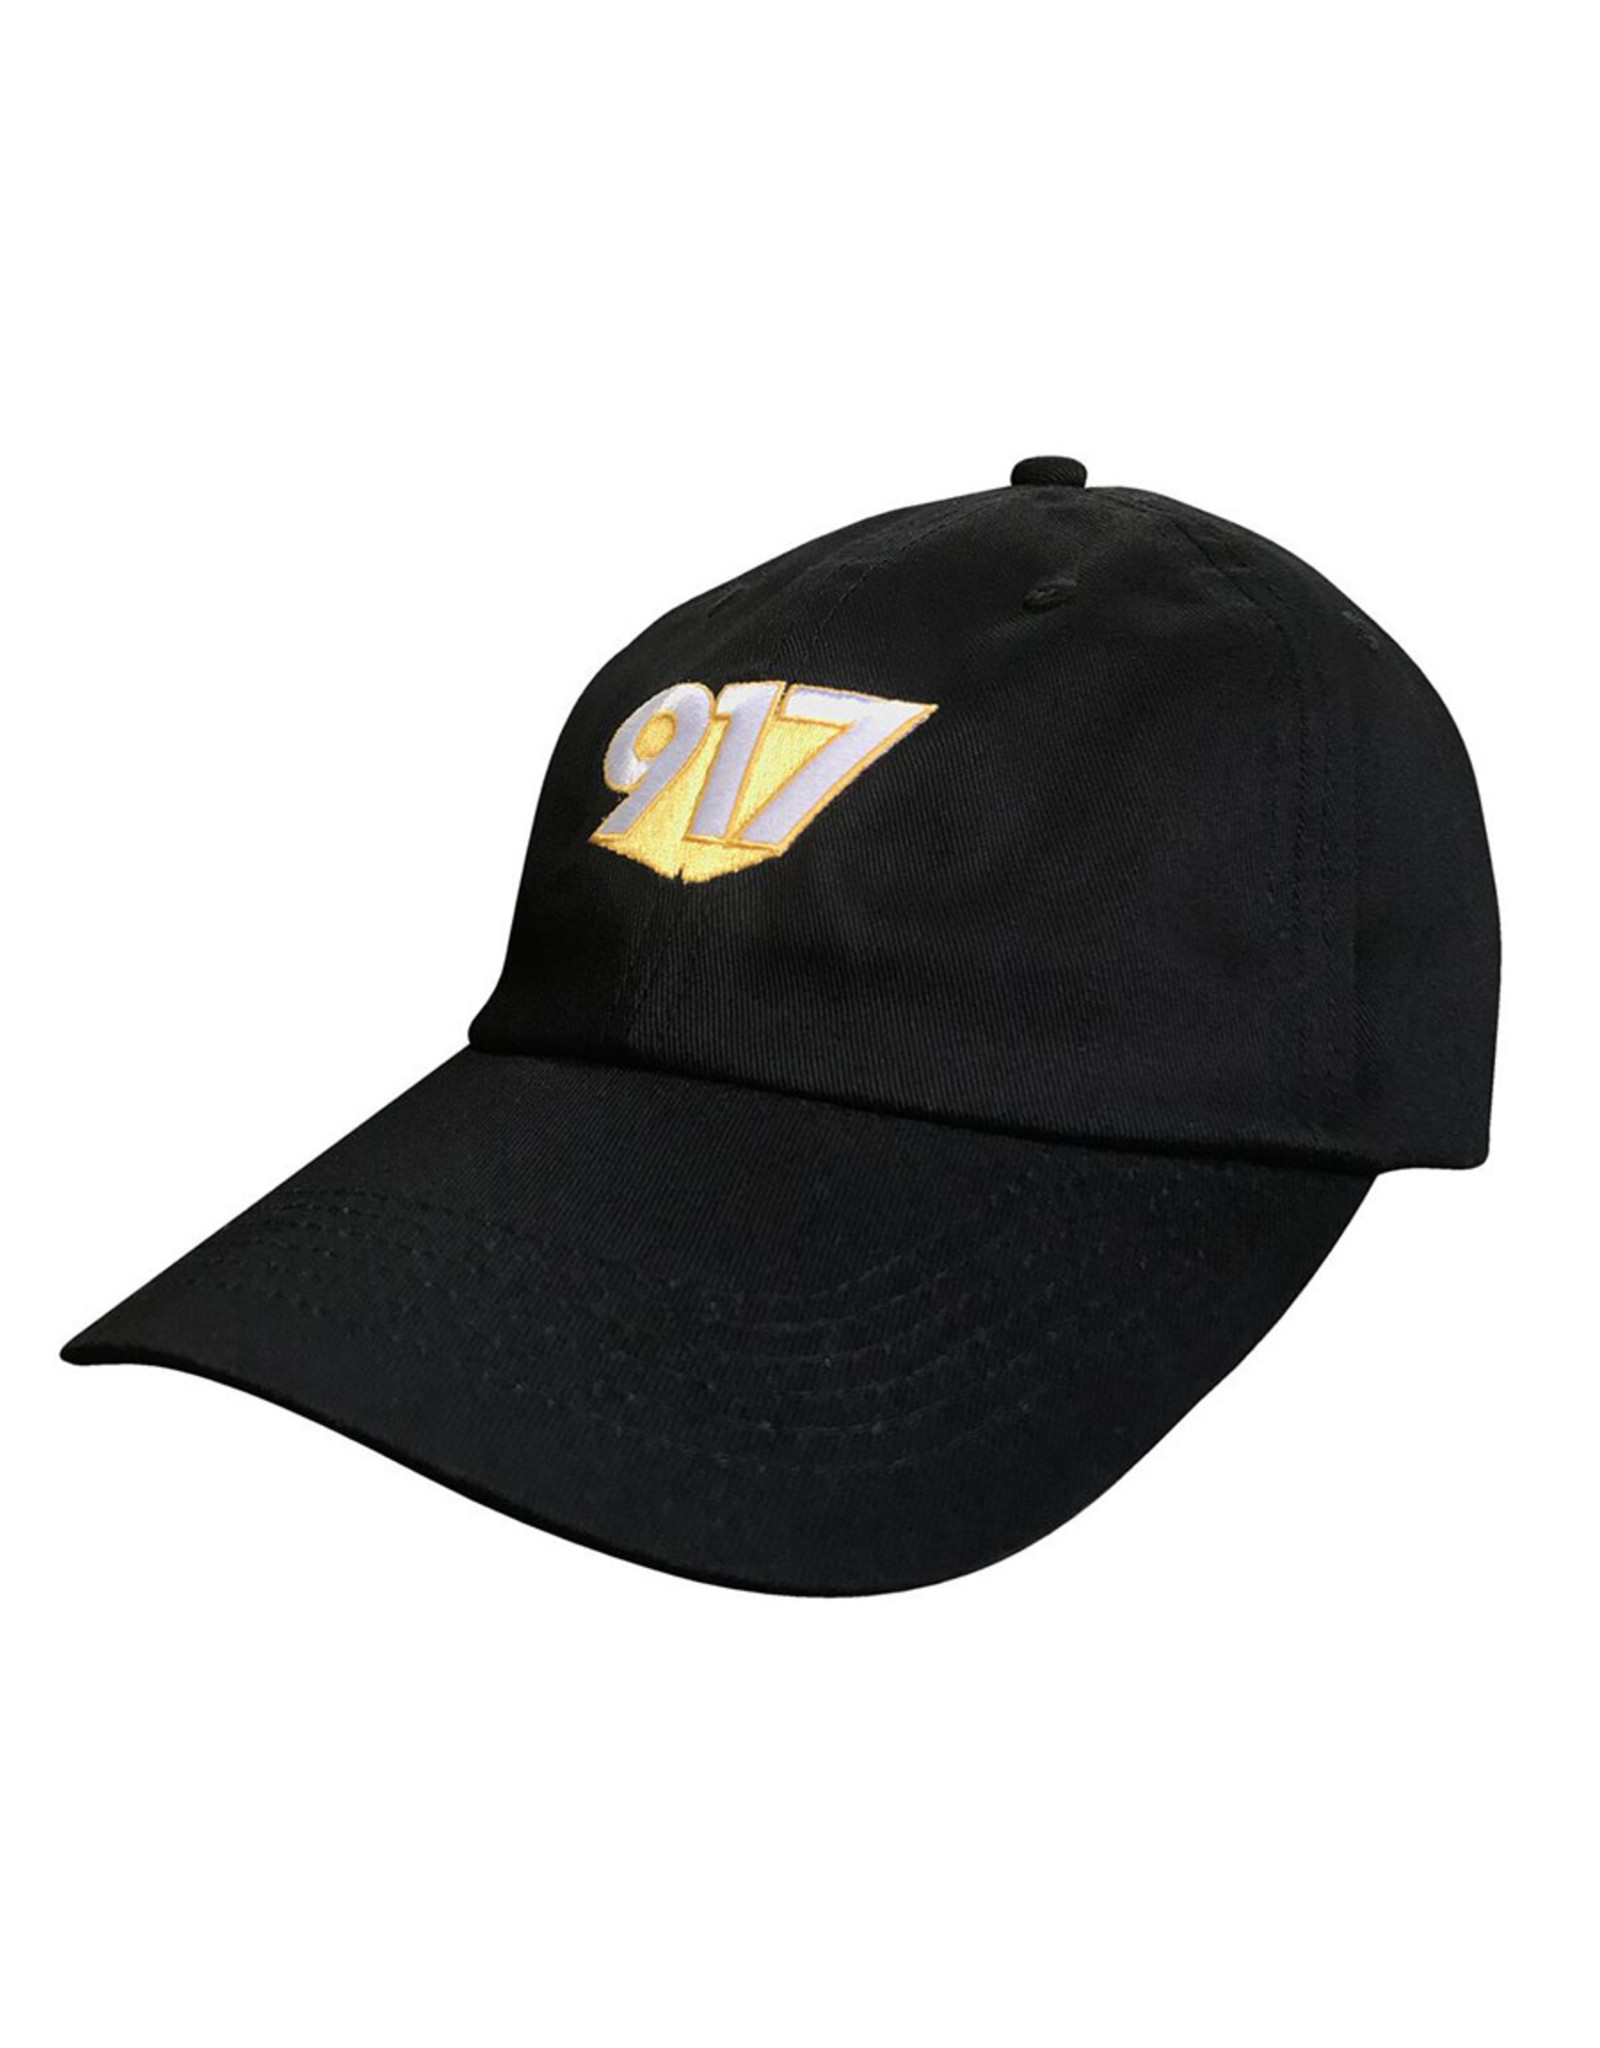 917 917 Hat 3D Dad Snapback (Black)